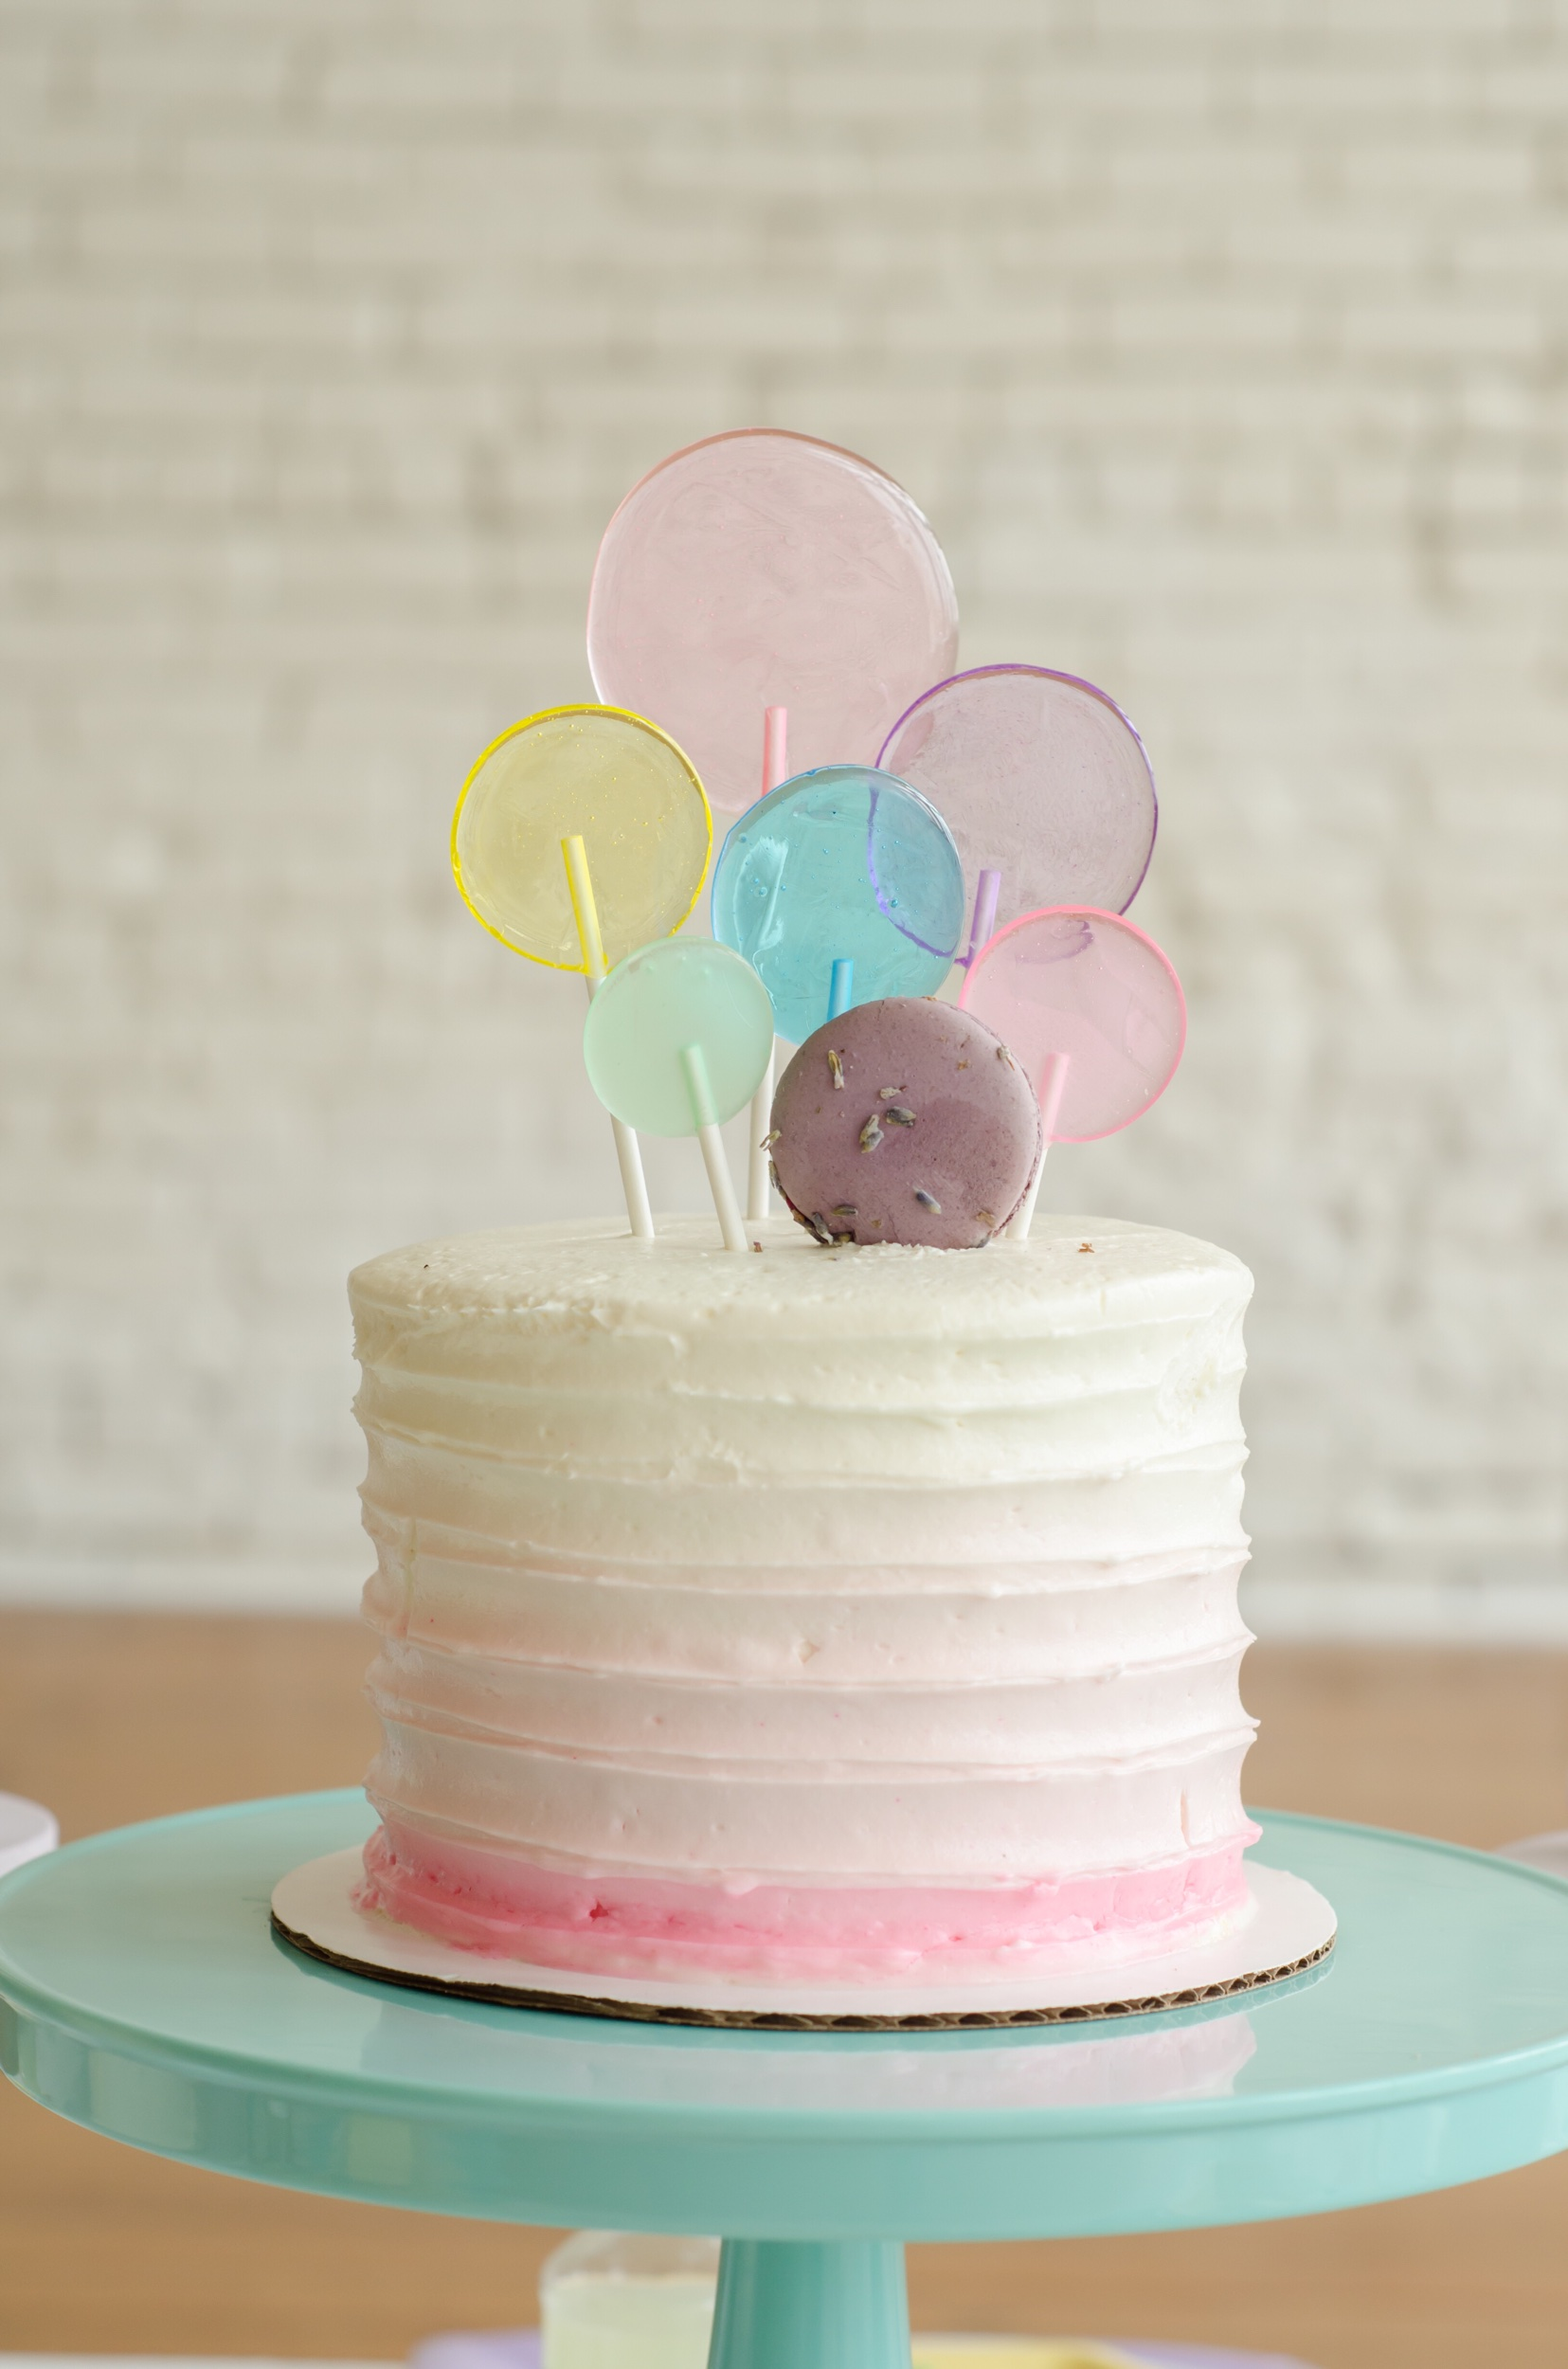 Ombre cake idea at a Bubble themed birthday bash